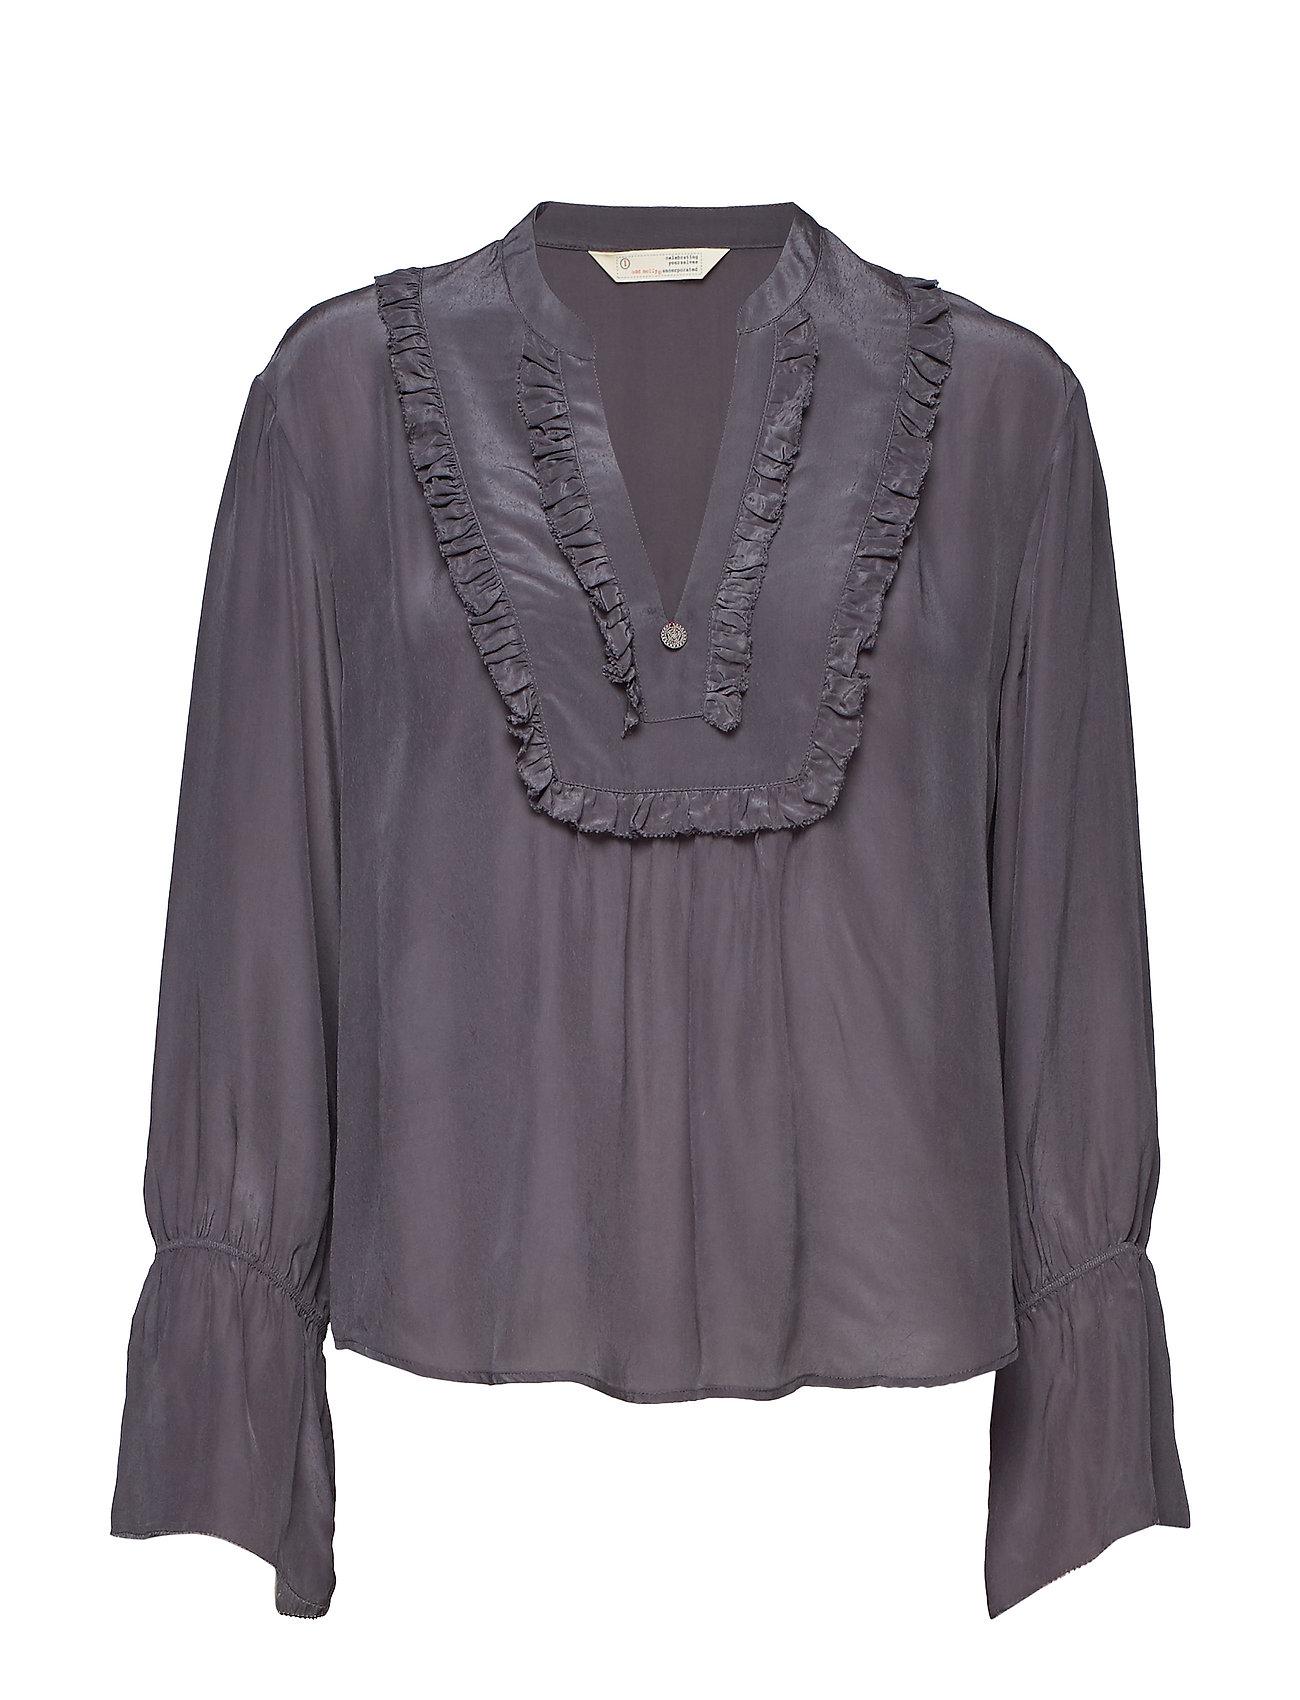 ODD MOLLY i-escape blouse - ASPHALT